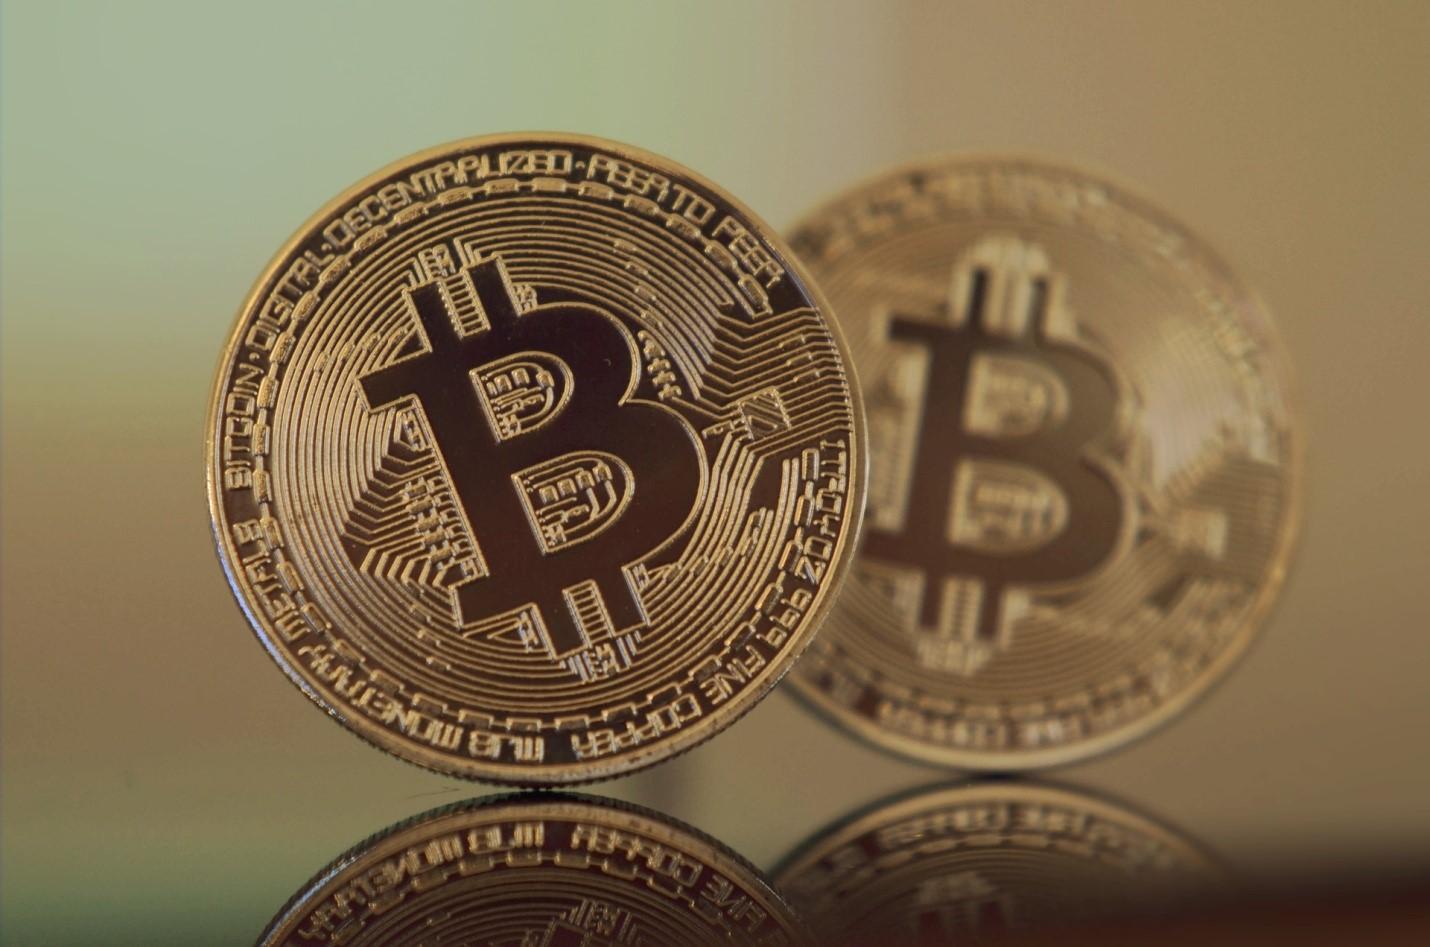 Bronze Bitcoin 2019